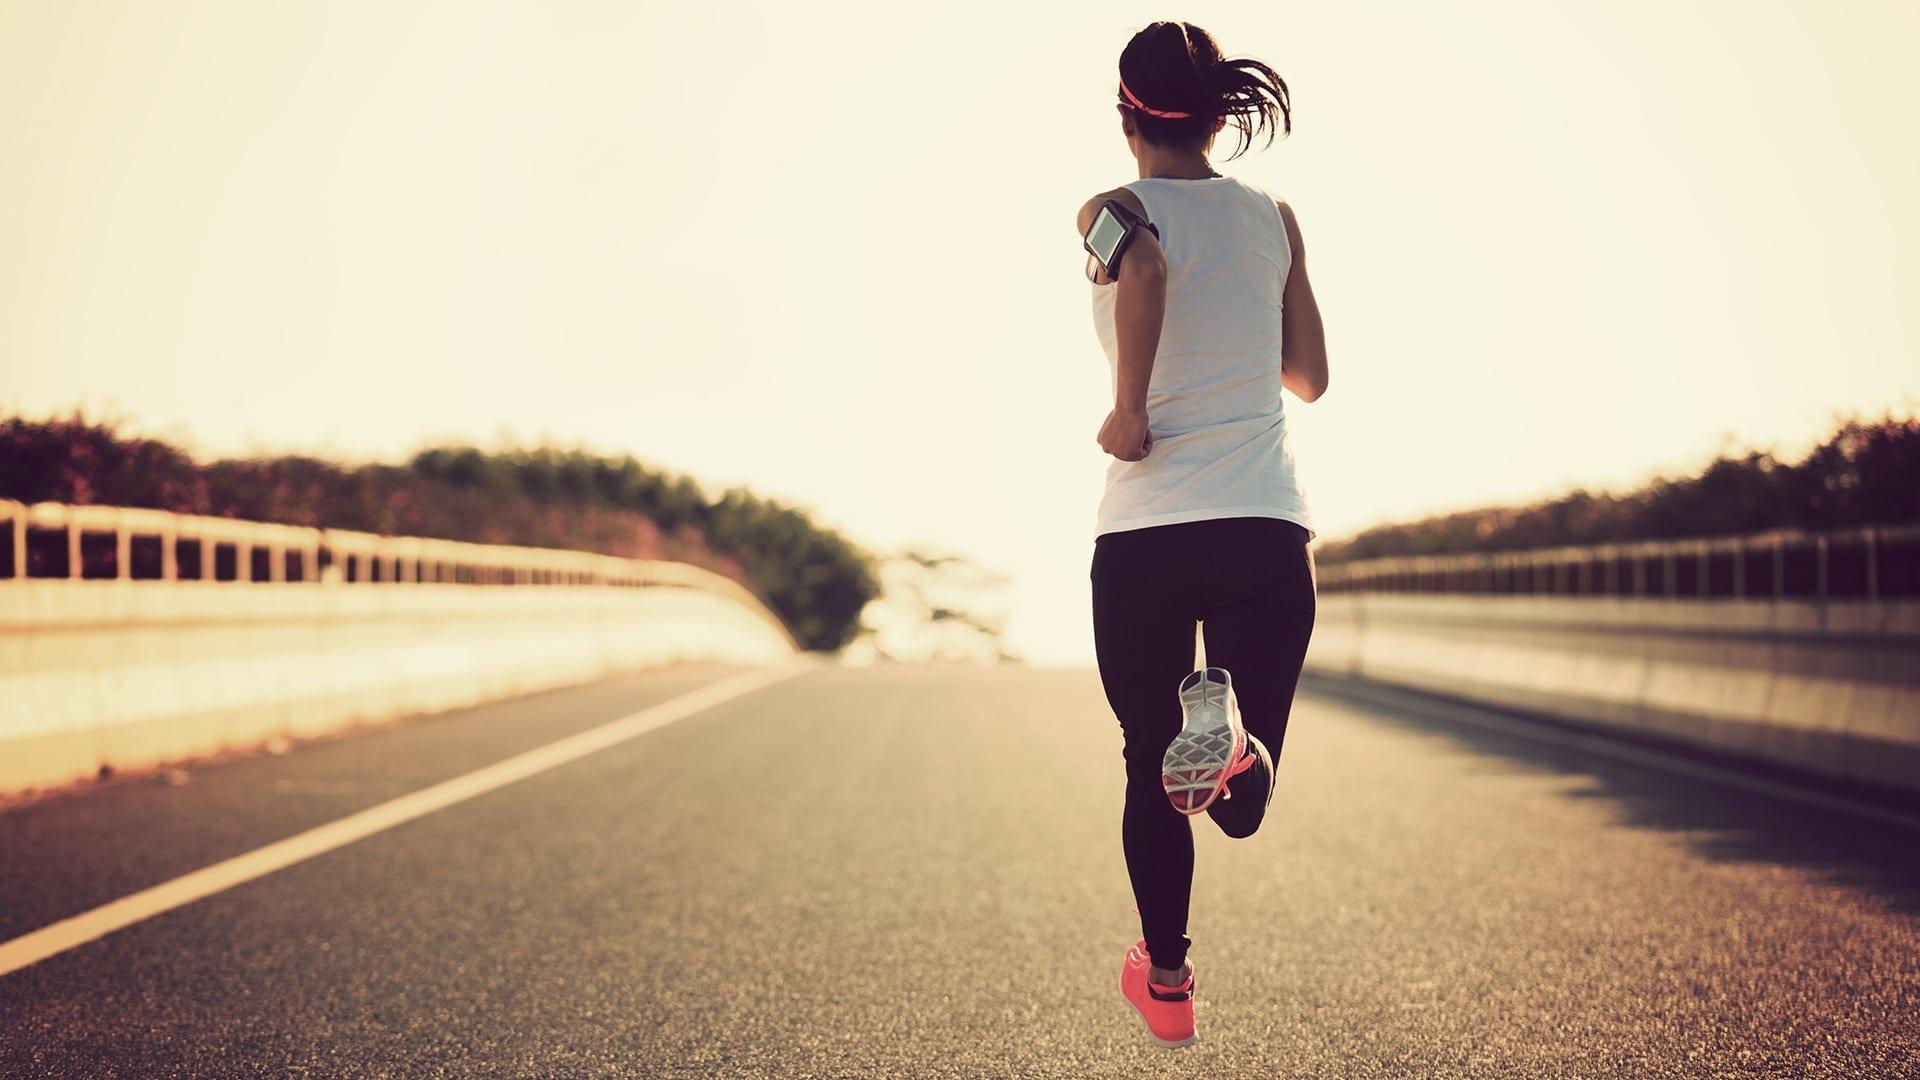 Running Wallpaper Pic